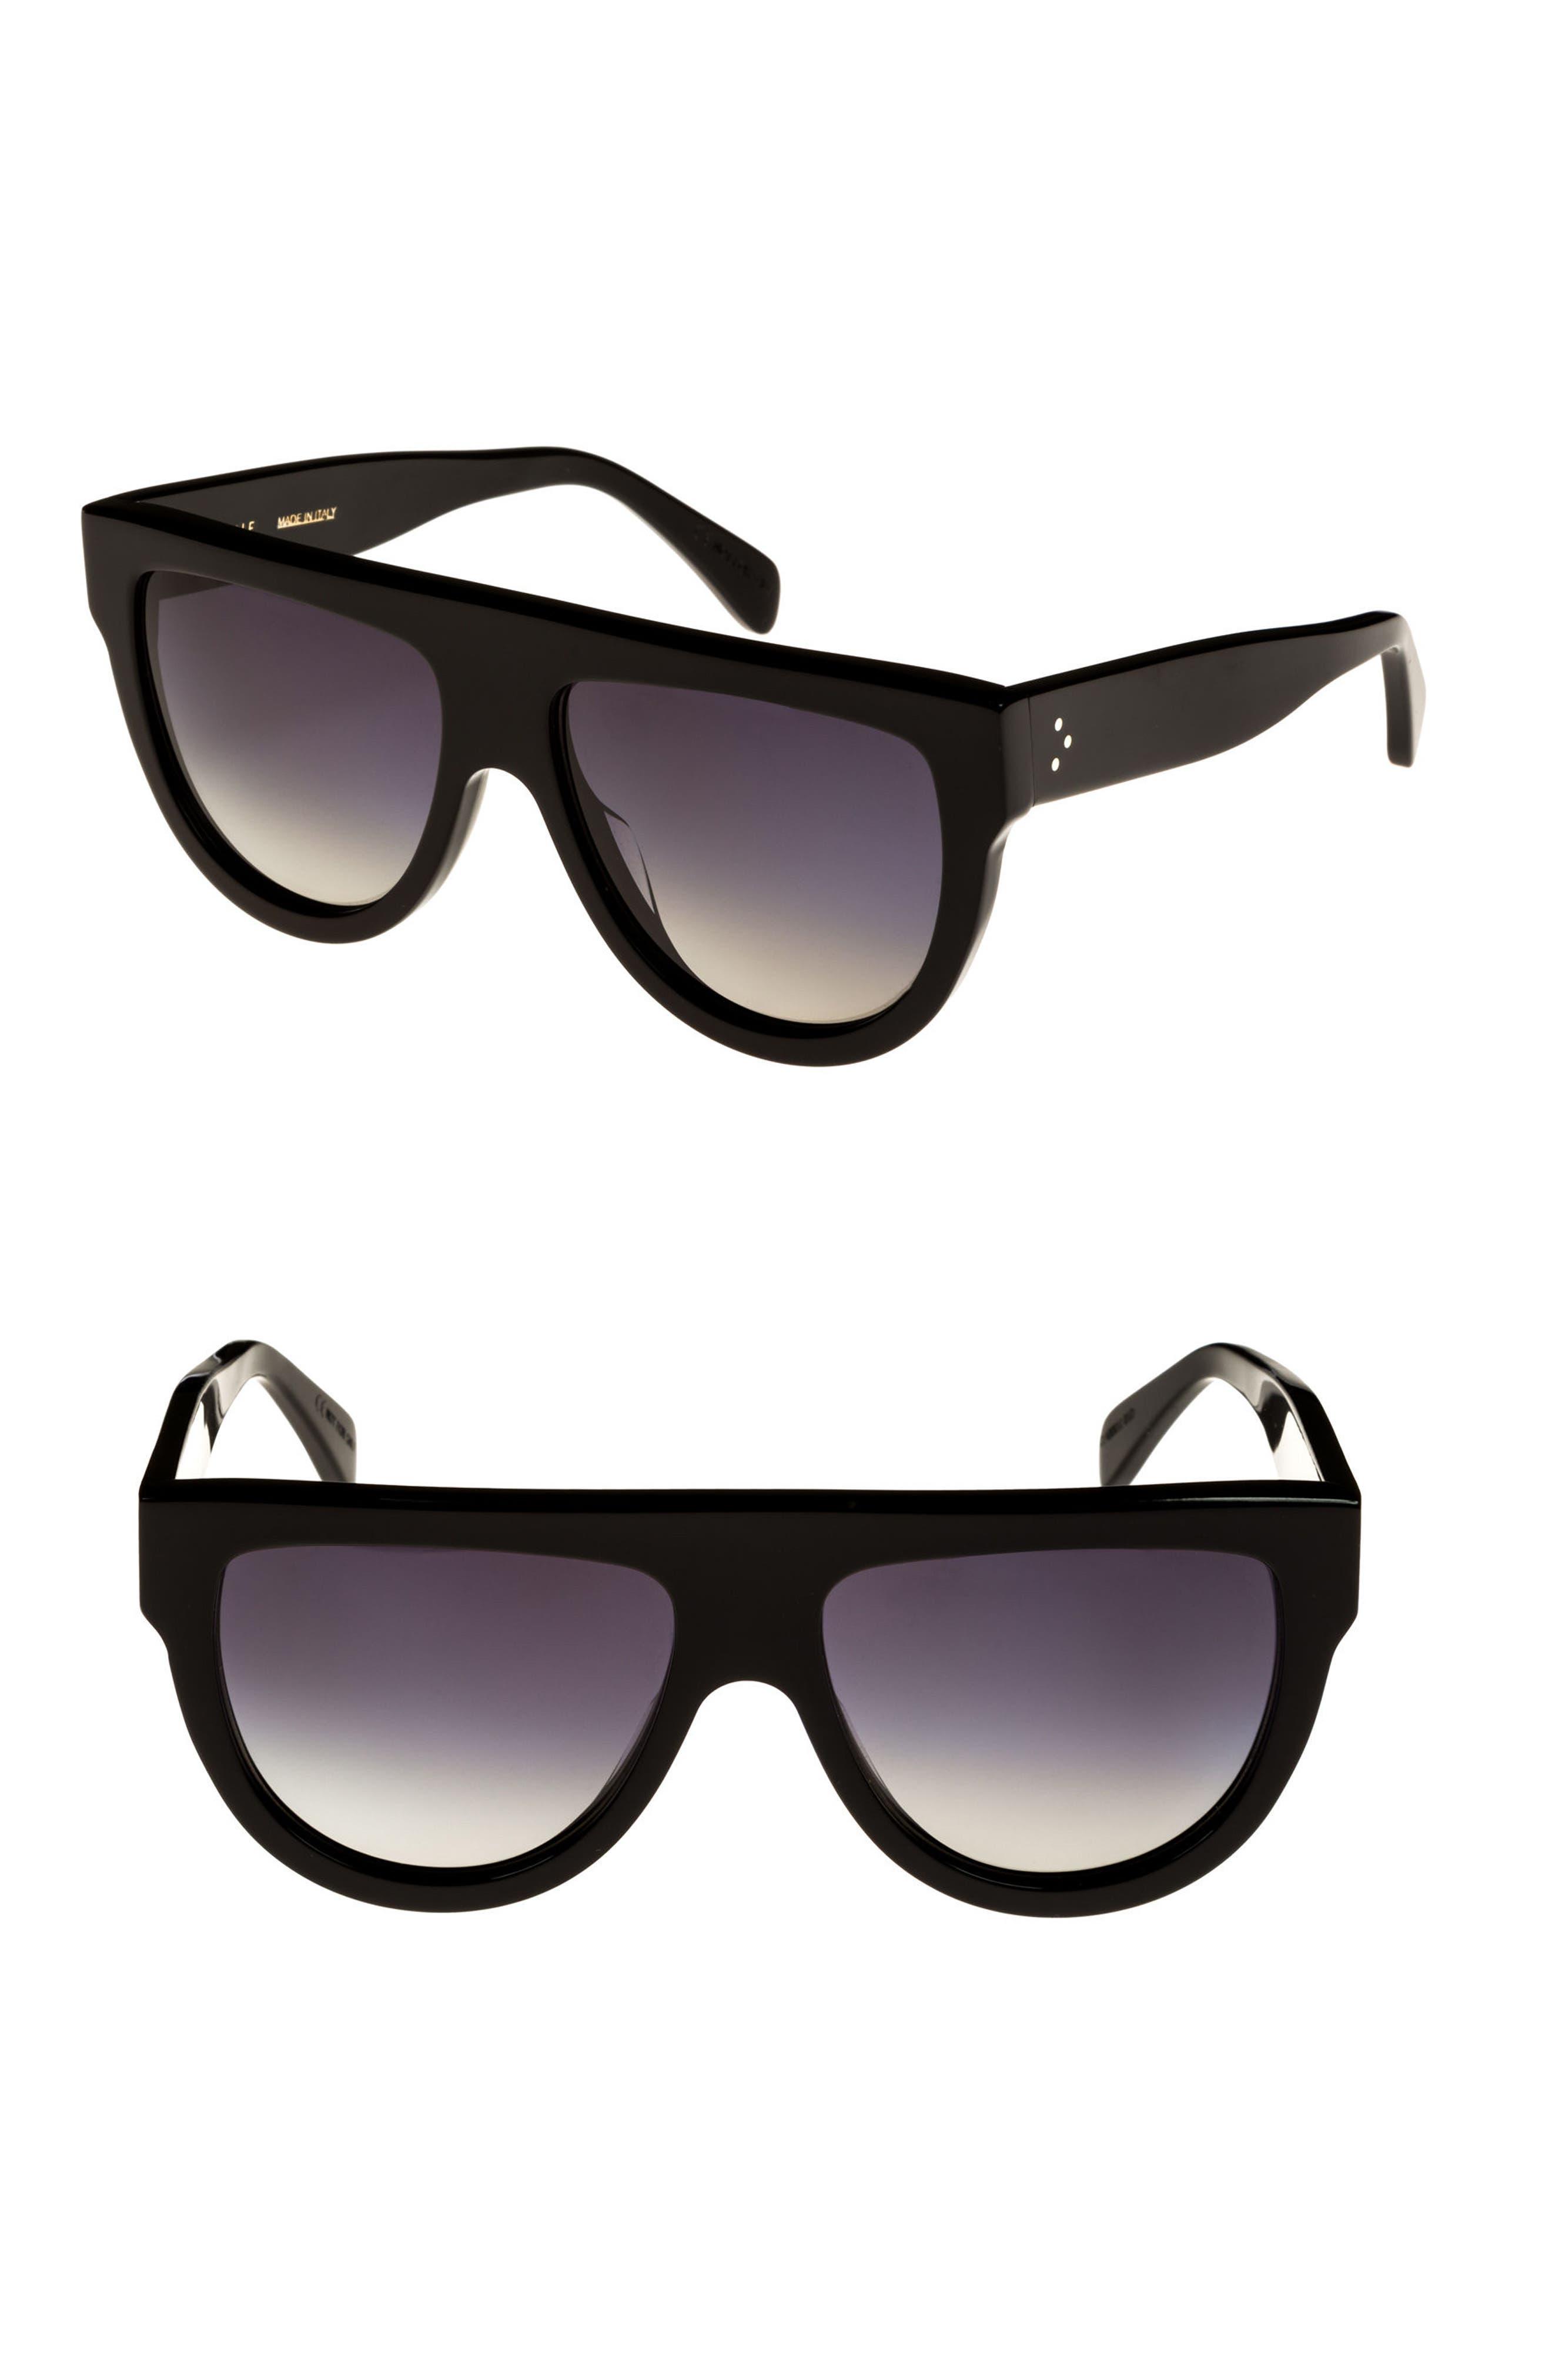 Special Fit 60mm Polarized Gradient Flat Top Sunglasses,                             Alternate thumbnail 2, color,                             BLACK/ GRADIENT SMOKE